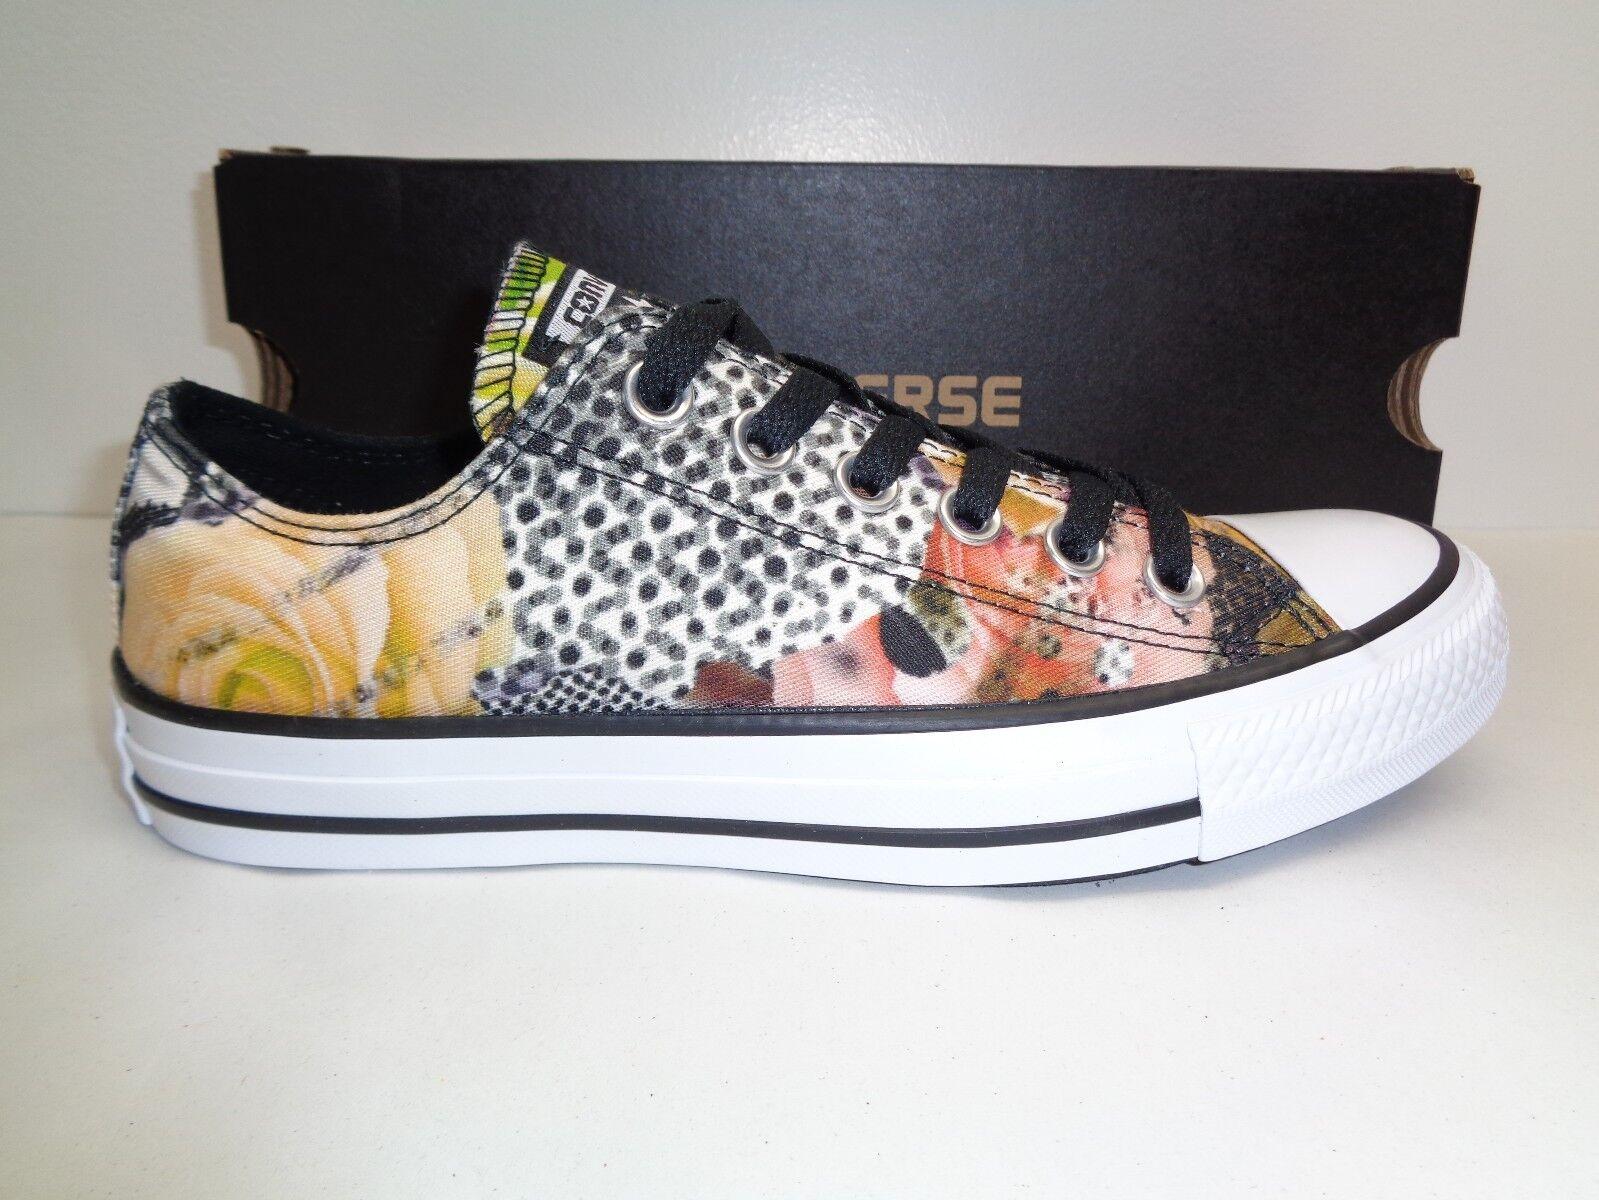 Converse Größe 10 DIGITAL FLORAL OX Canvas Fashion Sneakers NEU Damenschuhe Schuhes